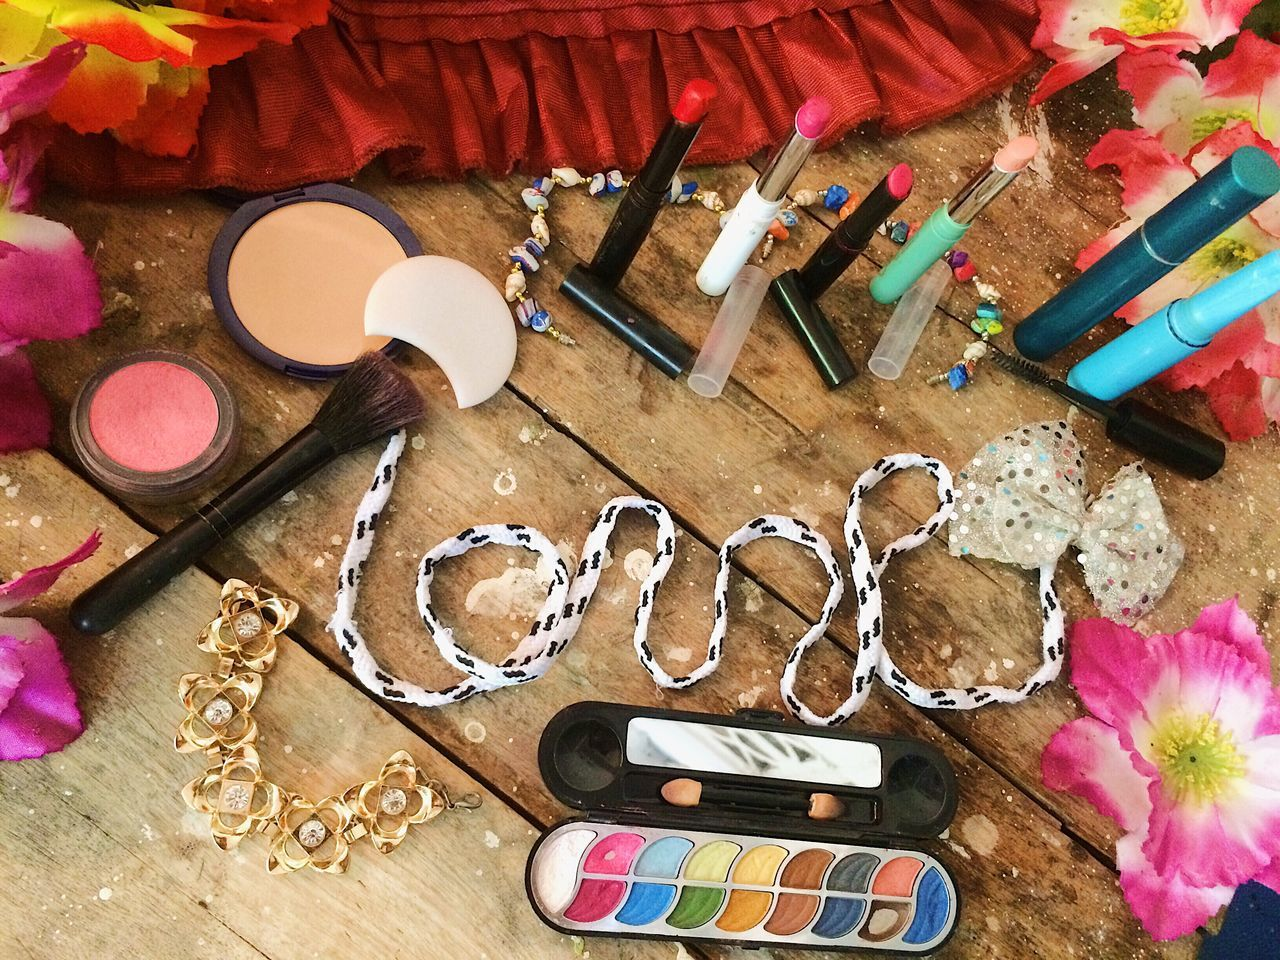 Makeup Makeupartist No People Indoors  Large Group Of Objects Close-up Day Makeup ♥ Makeupaddict Make-up